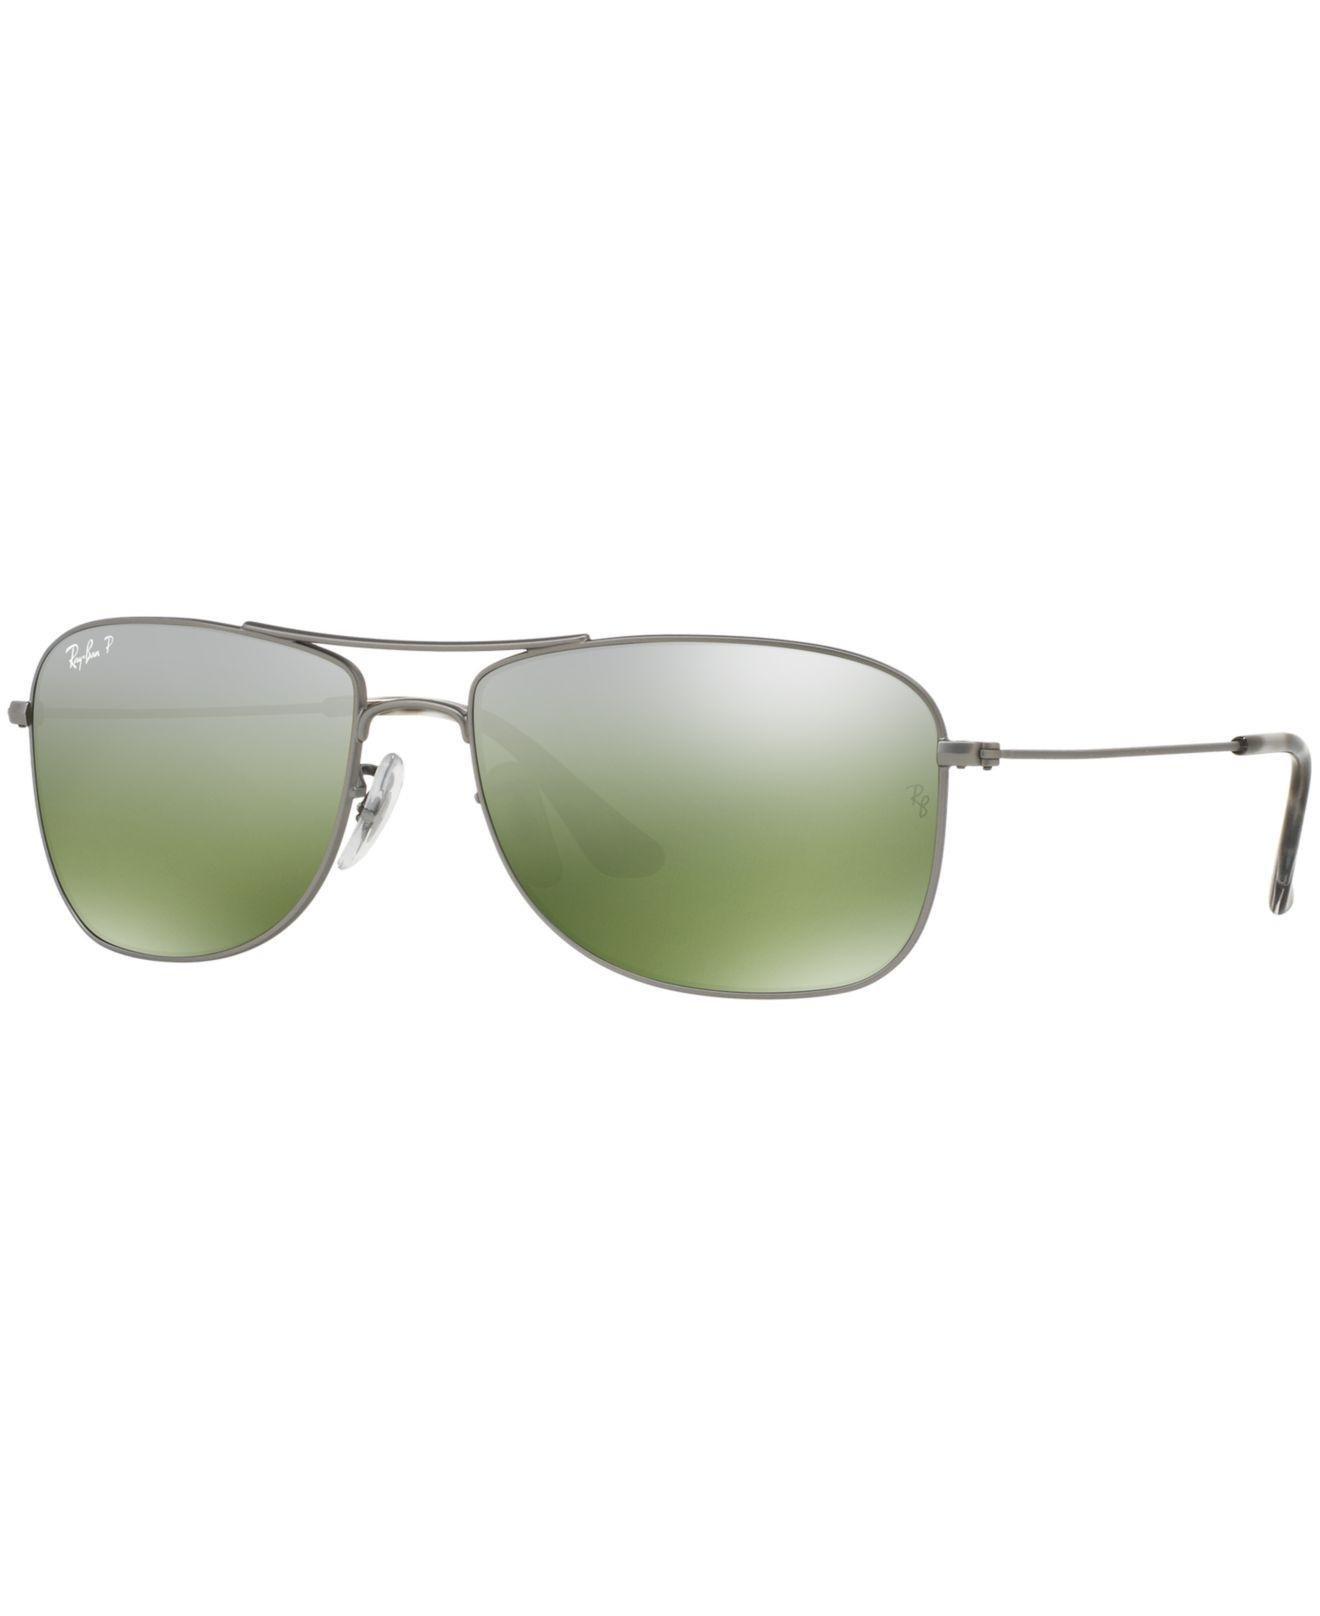 2d38ddbc74a Ray-Ban. Women s Metallic Sunglasses